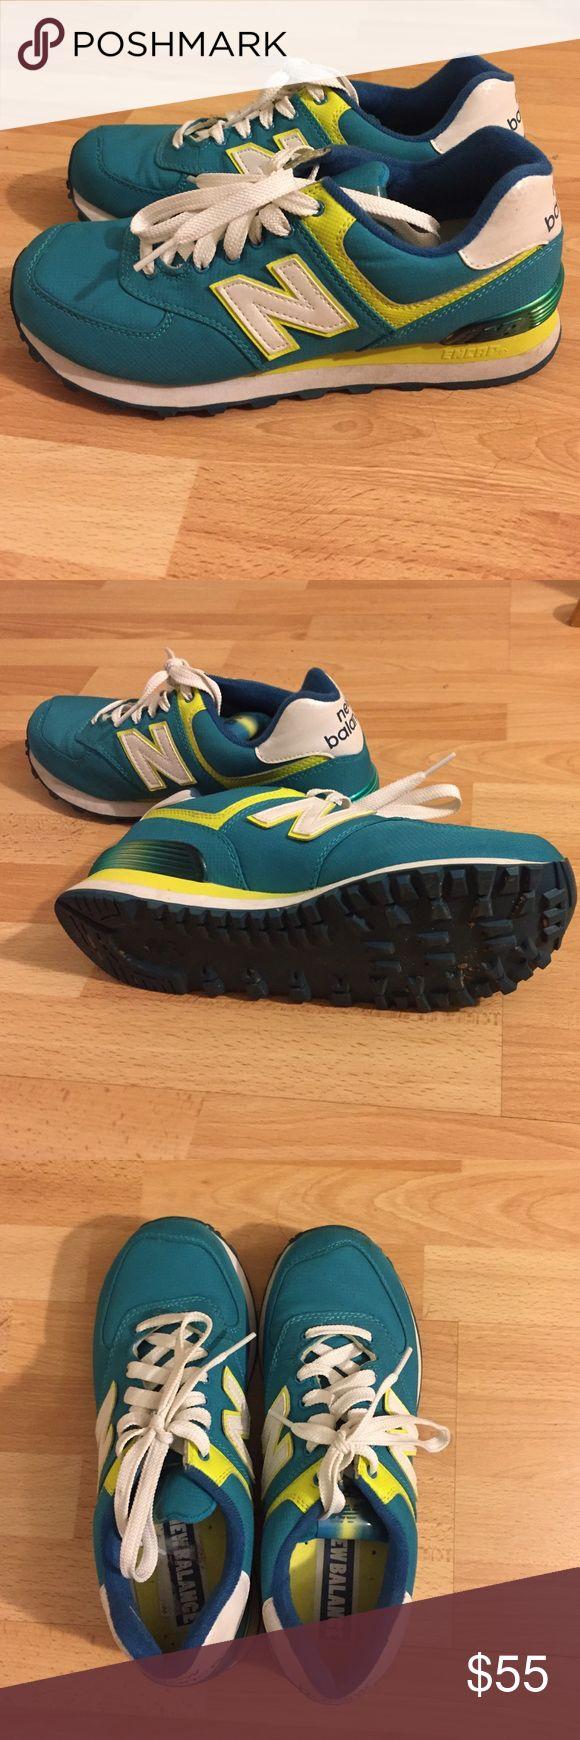 New balance encap sneakers Highlighter green and teal new balance sneakers. New Balance Shoes